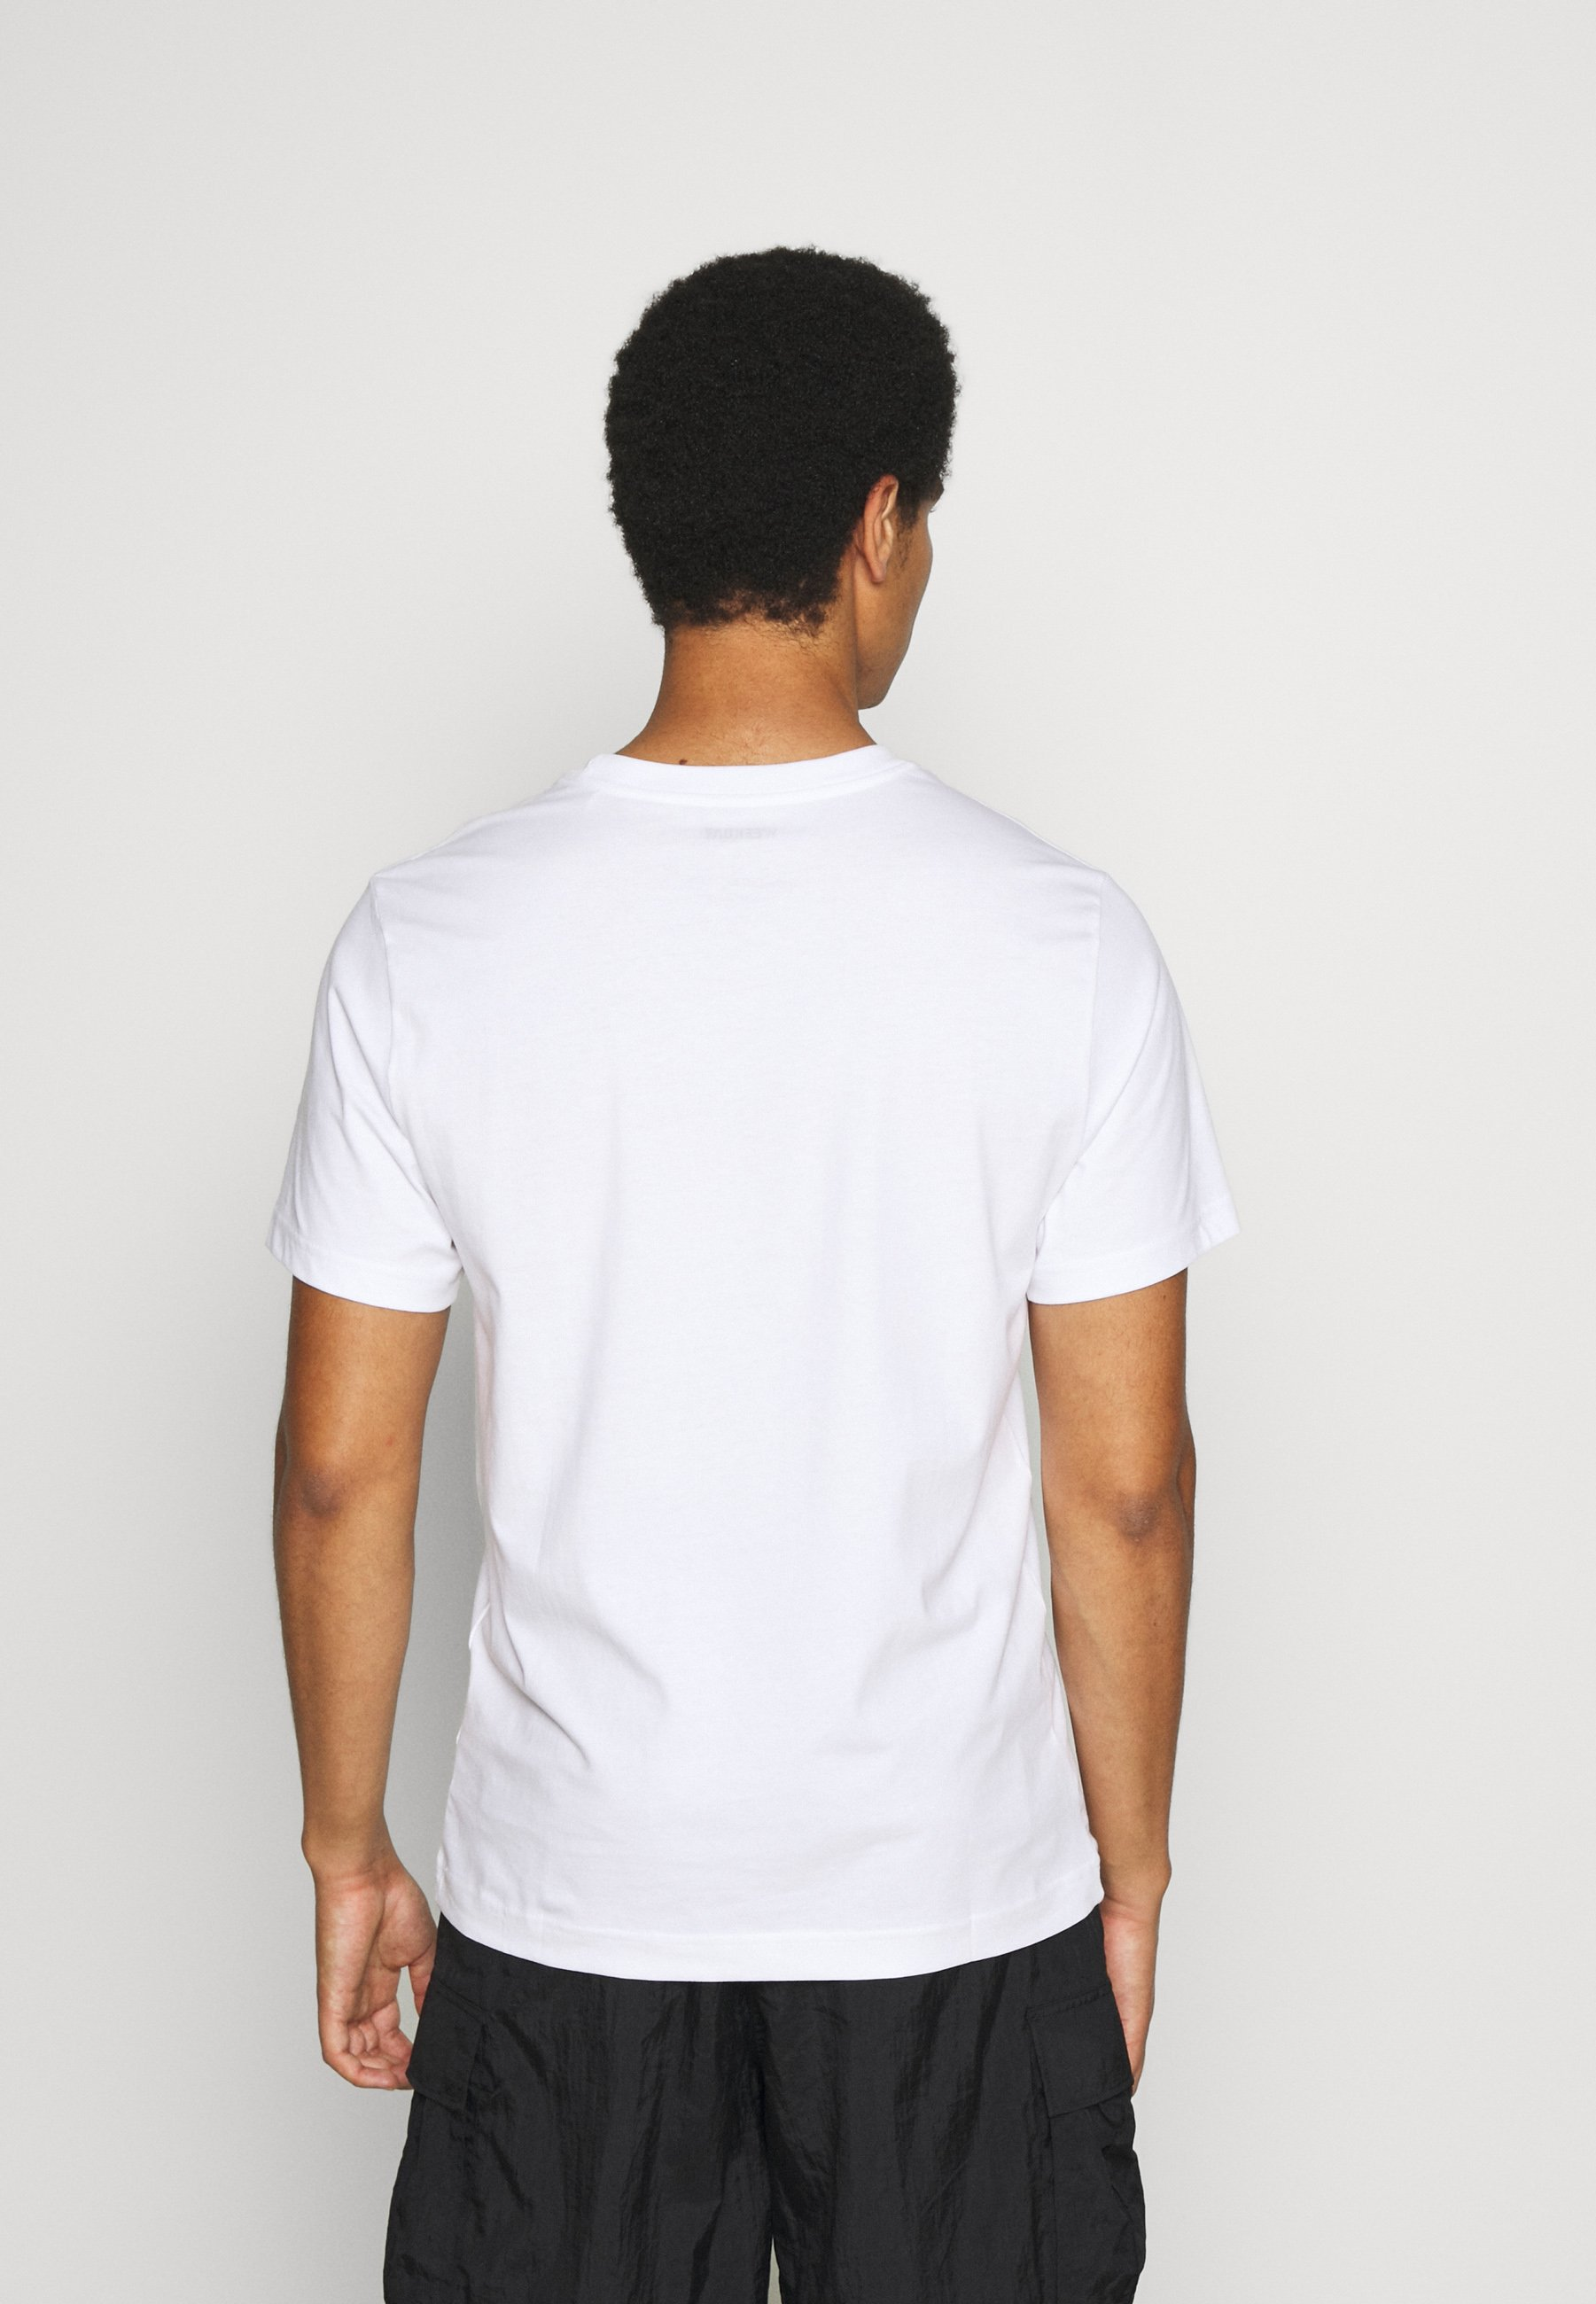 Weekday Basic T-shirt - white lWlVy